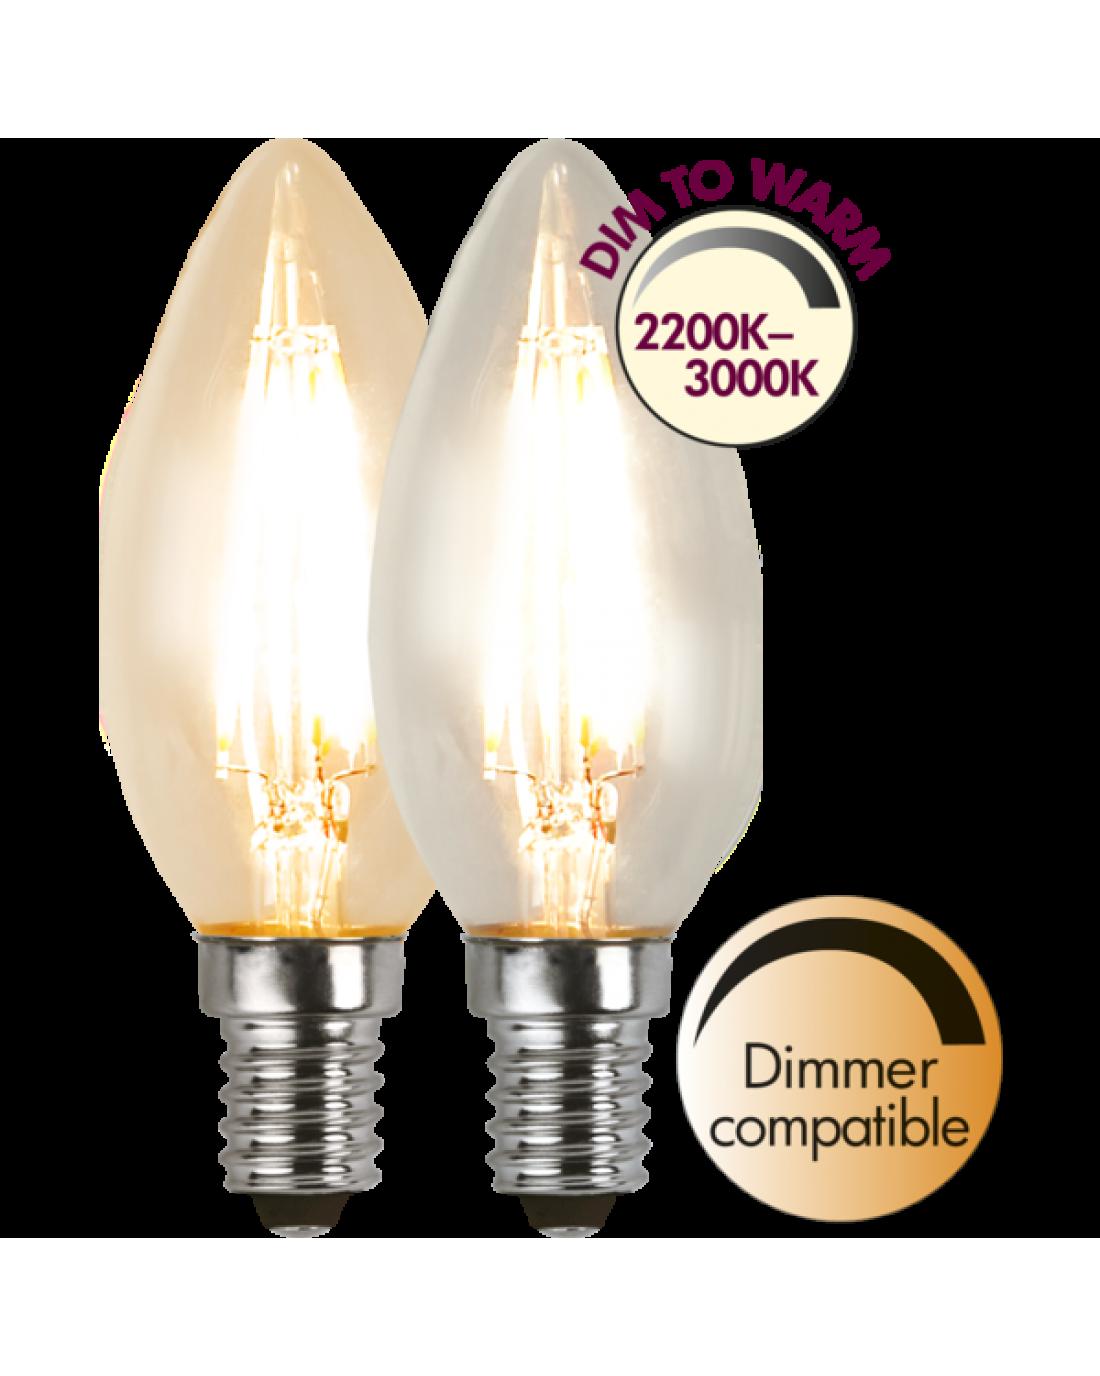 Kronljus LED Lampa E14 DIM TO WARM Filament i 2020